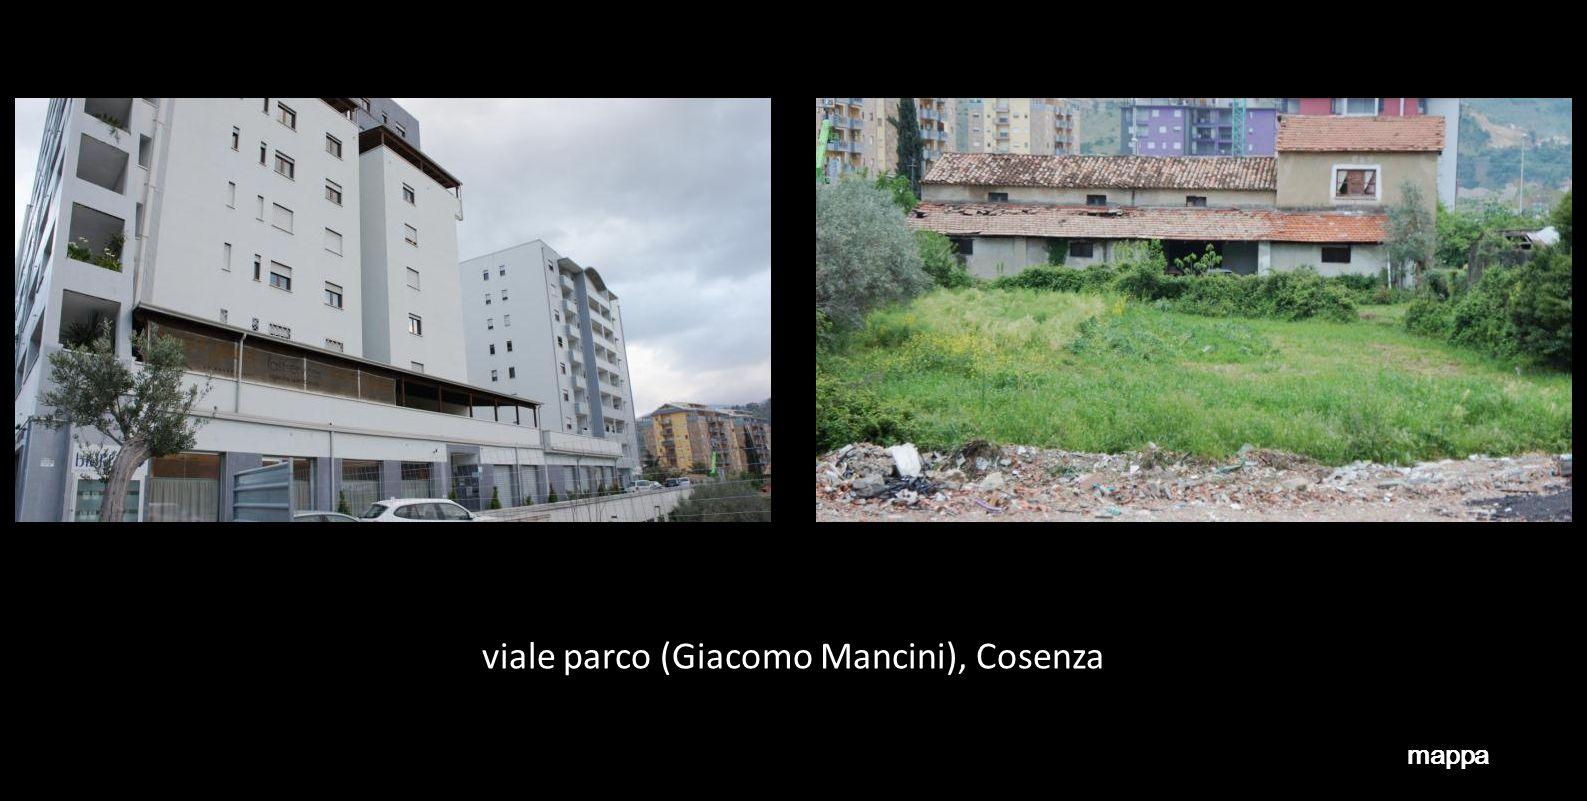 viale parco (Giacomo Mancini), Cosenza mappa